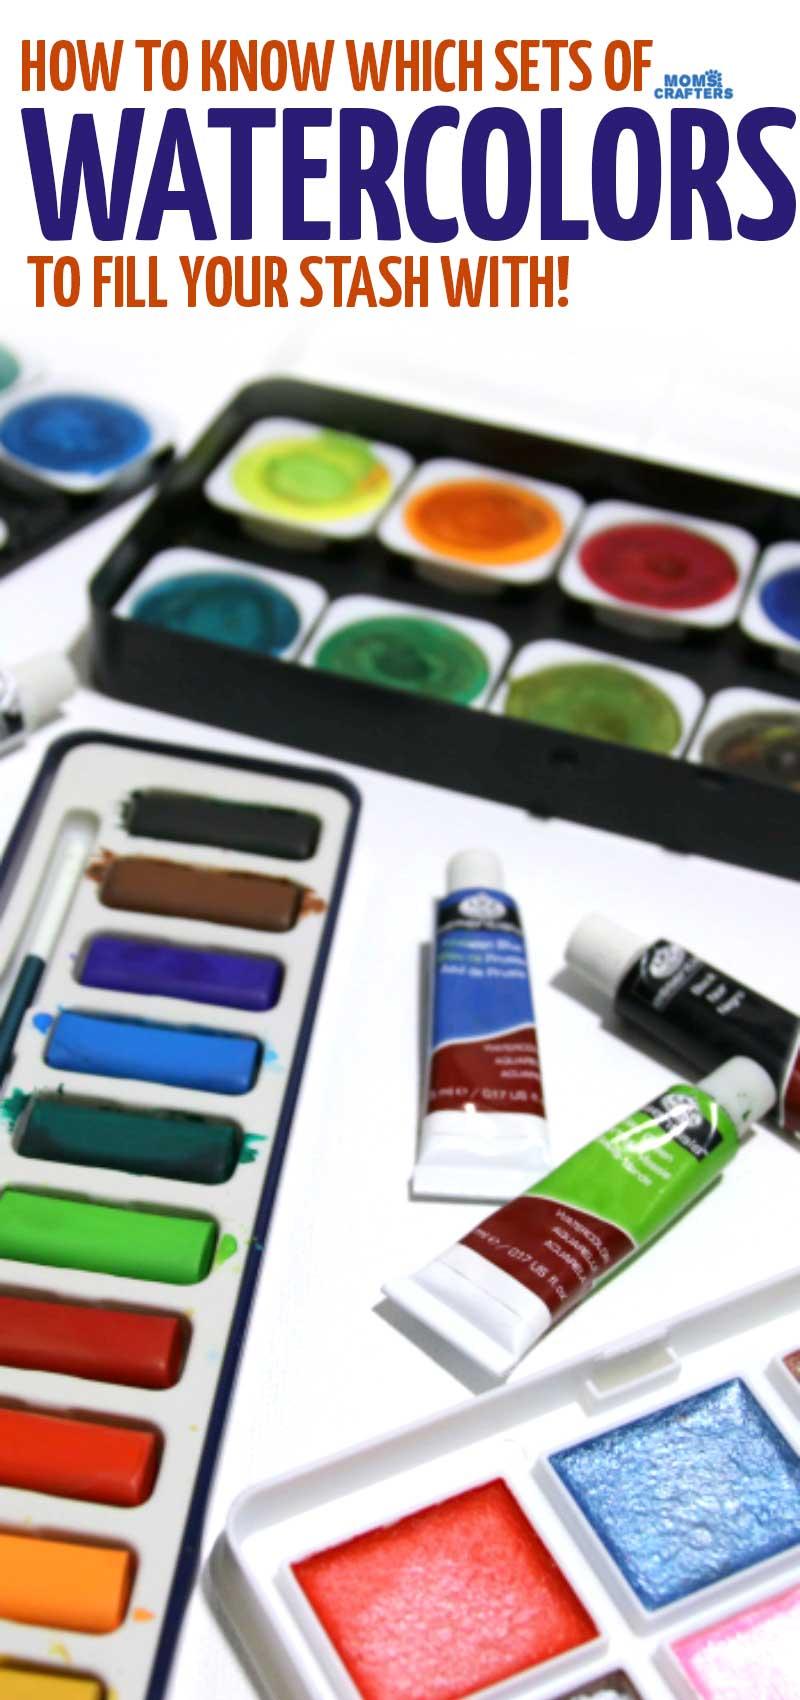 Best Watercolor Paints - Watercolor Paint Sets for Beginners